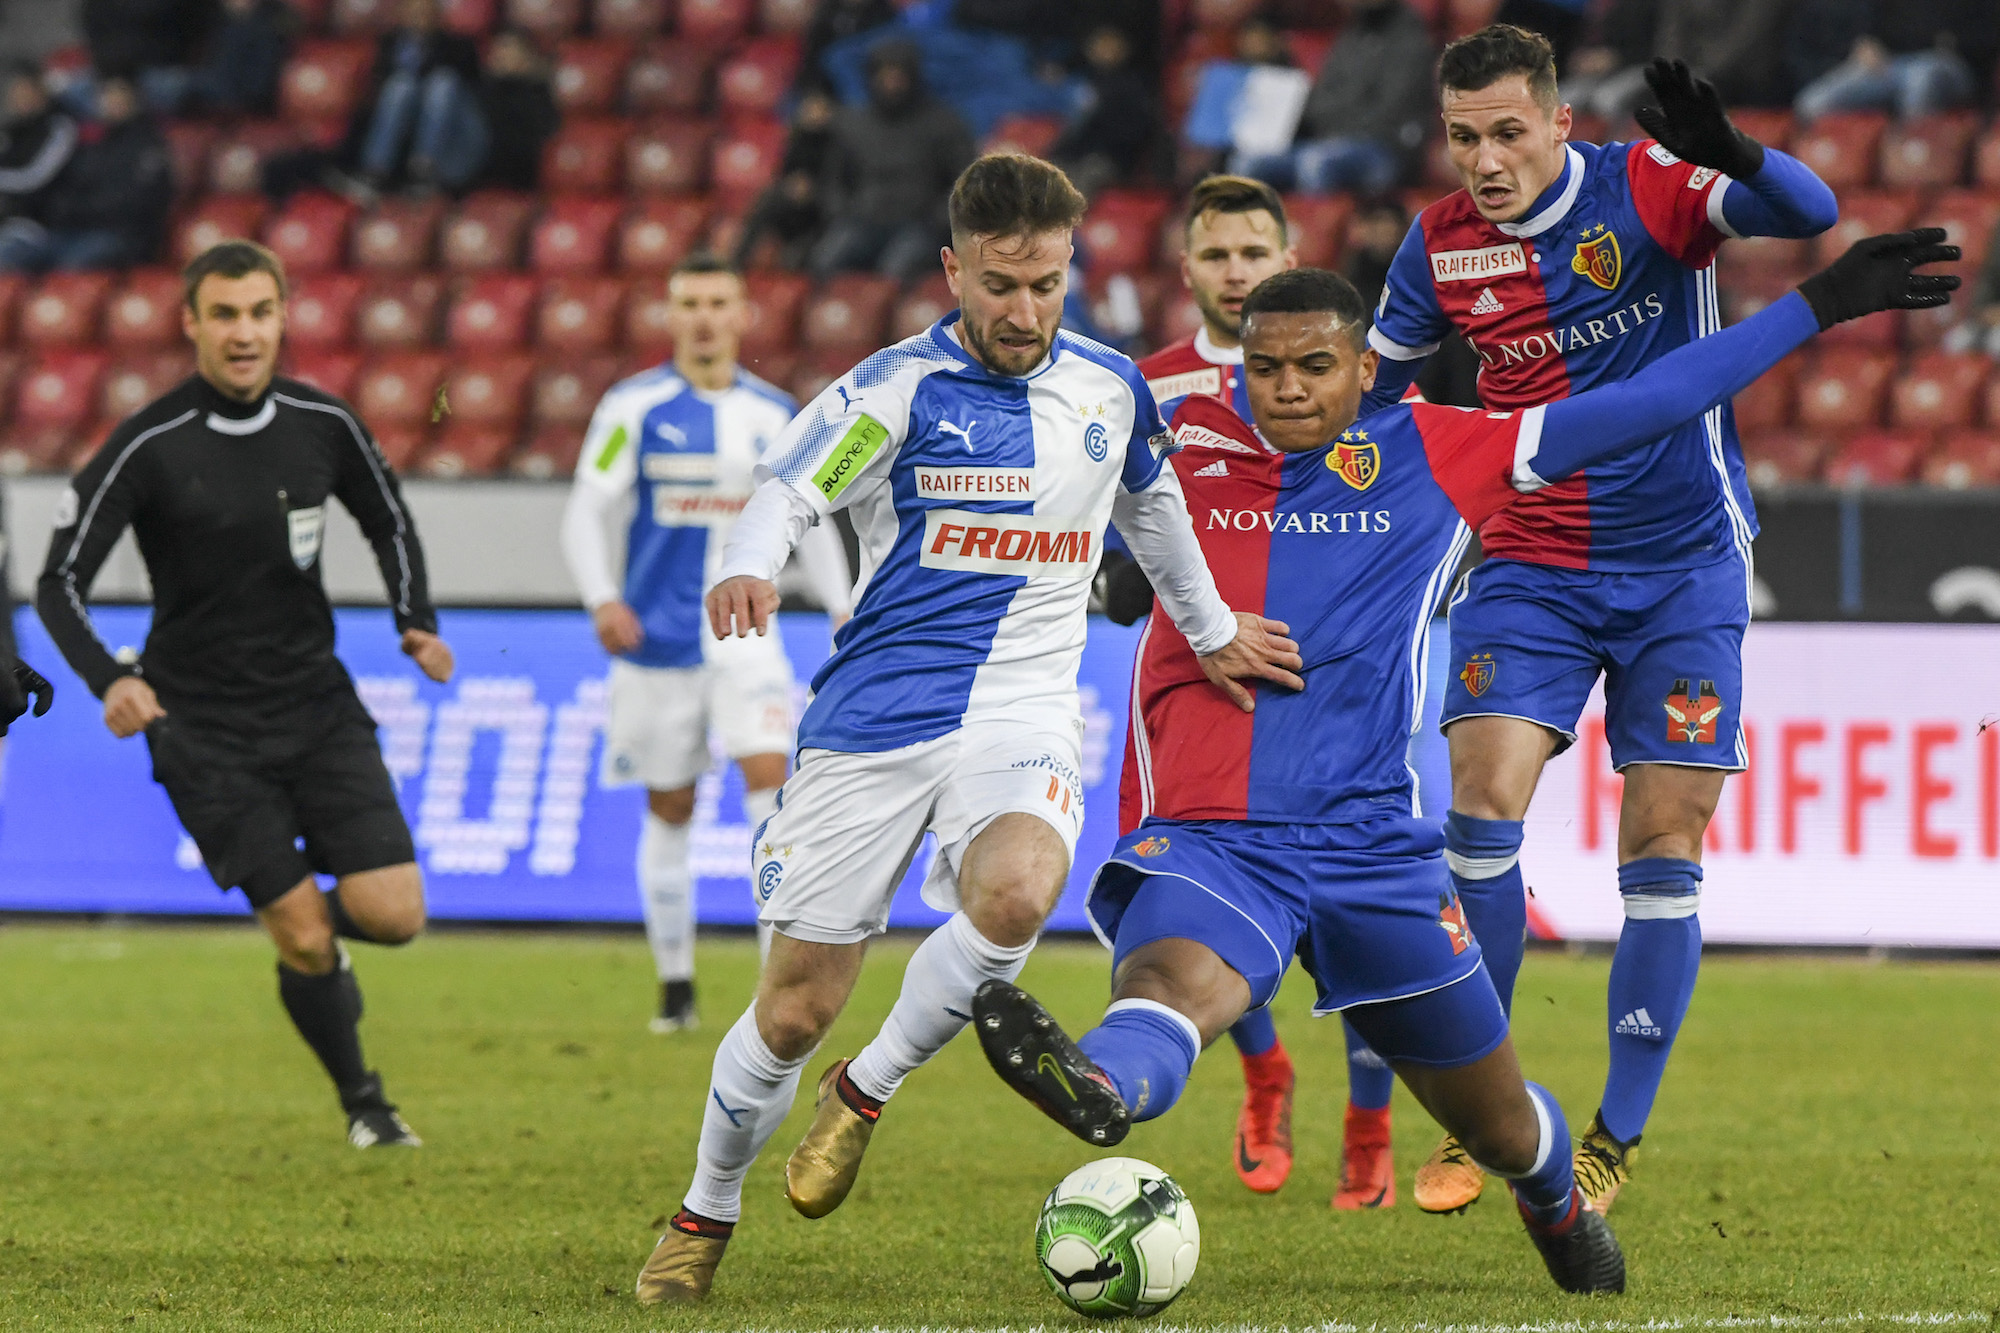 17.12.2017; Zuerich; Fussball Super League - Grasshopper Club Zuerich - FC Basel; Mergim Brahimi (GC) Manuel Akanji (Basel)